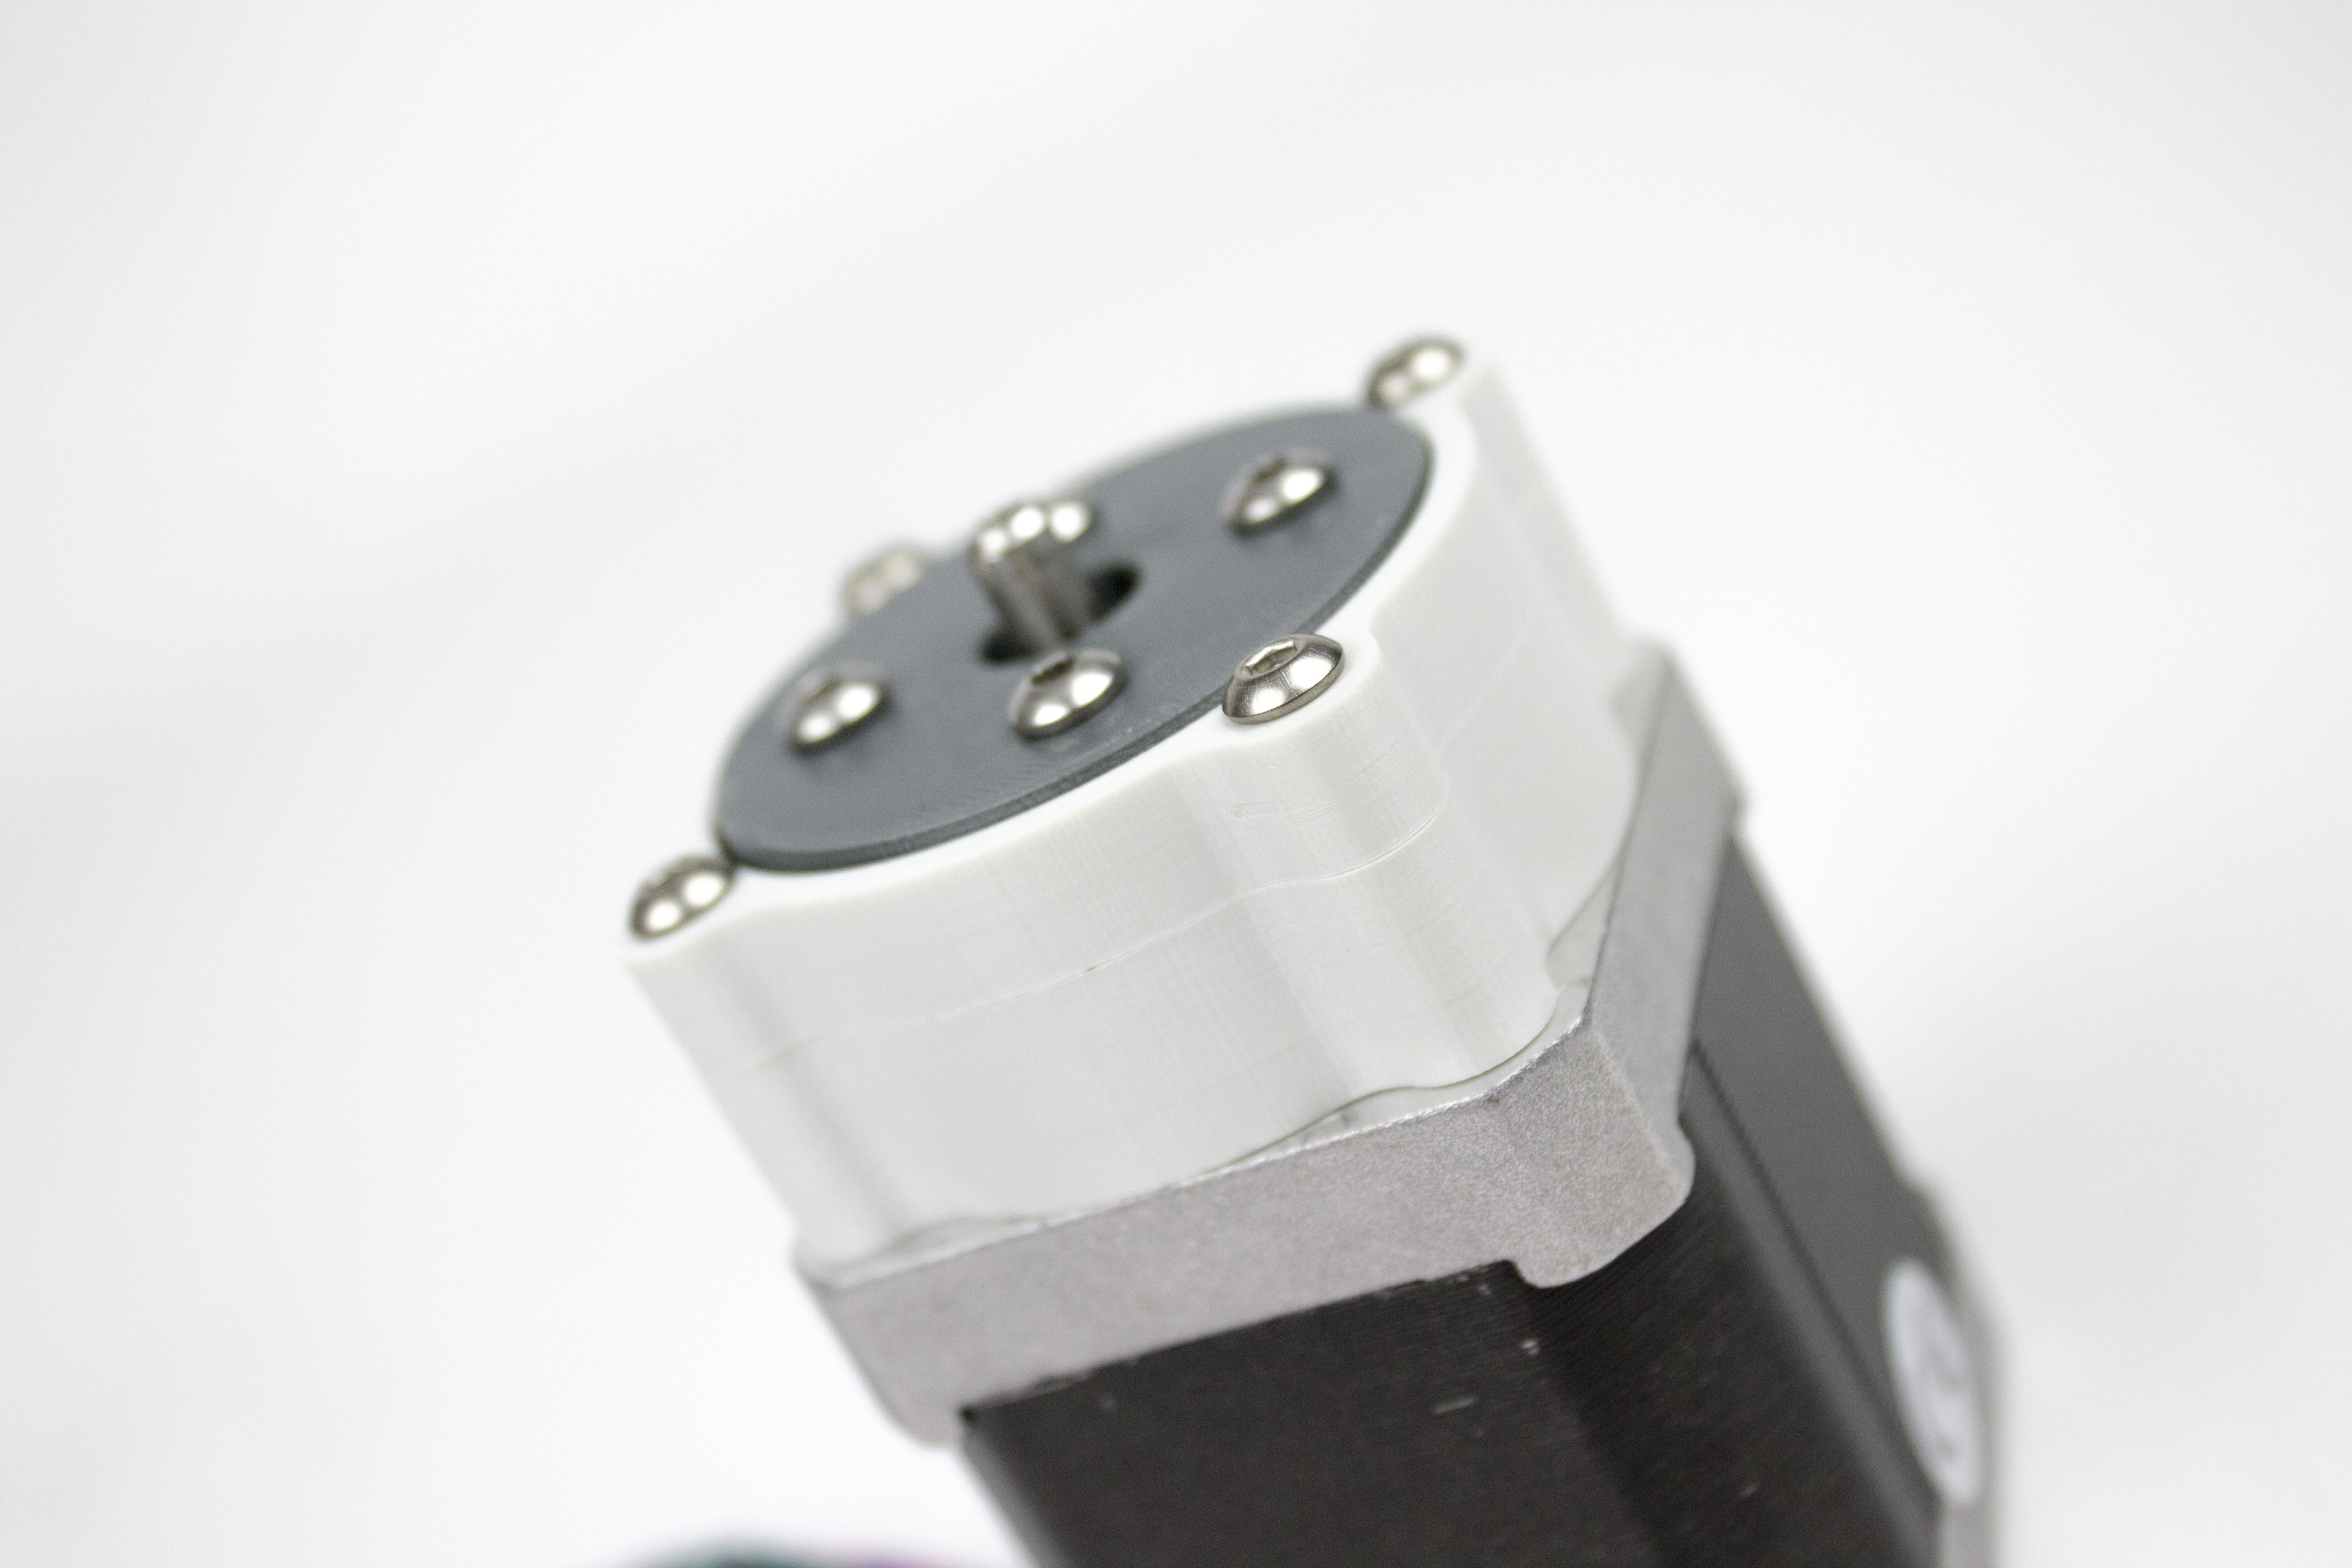 Designed by Kevin: https://www.youmagine.com/designs/nema17-4-1-gearbox